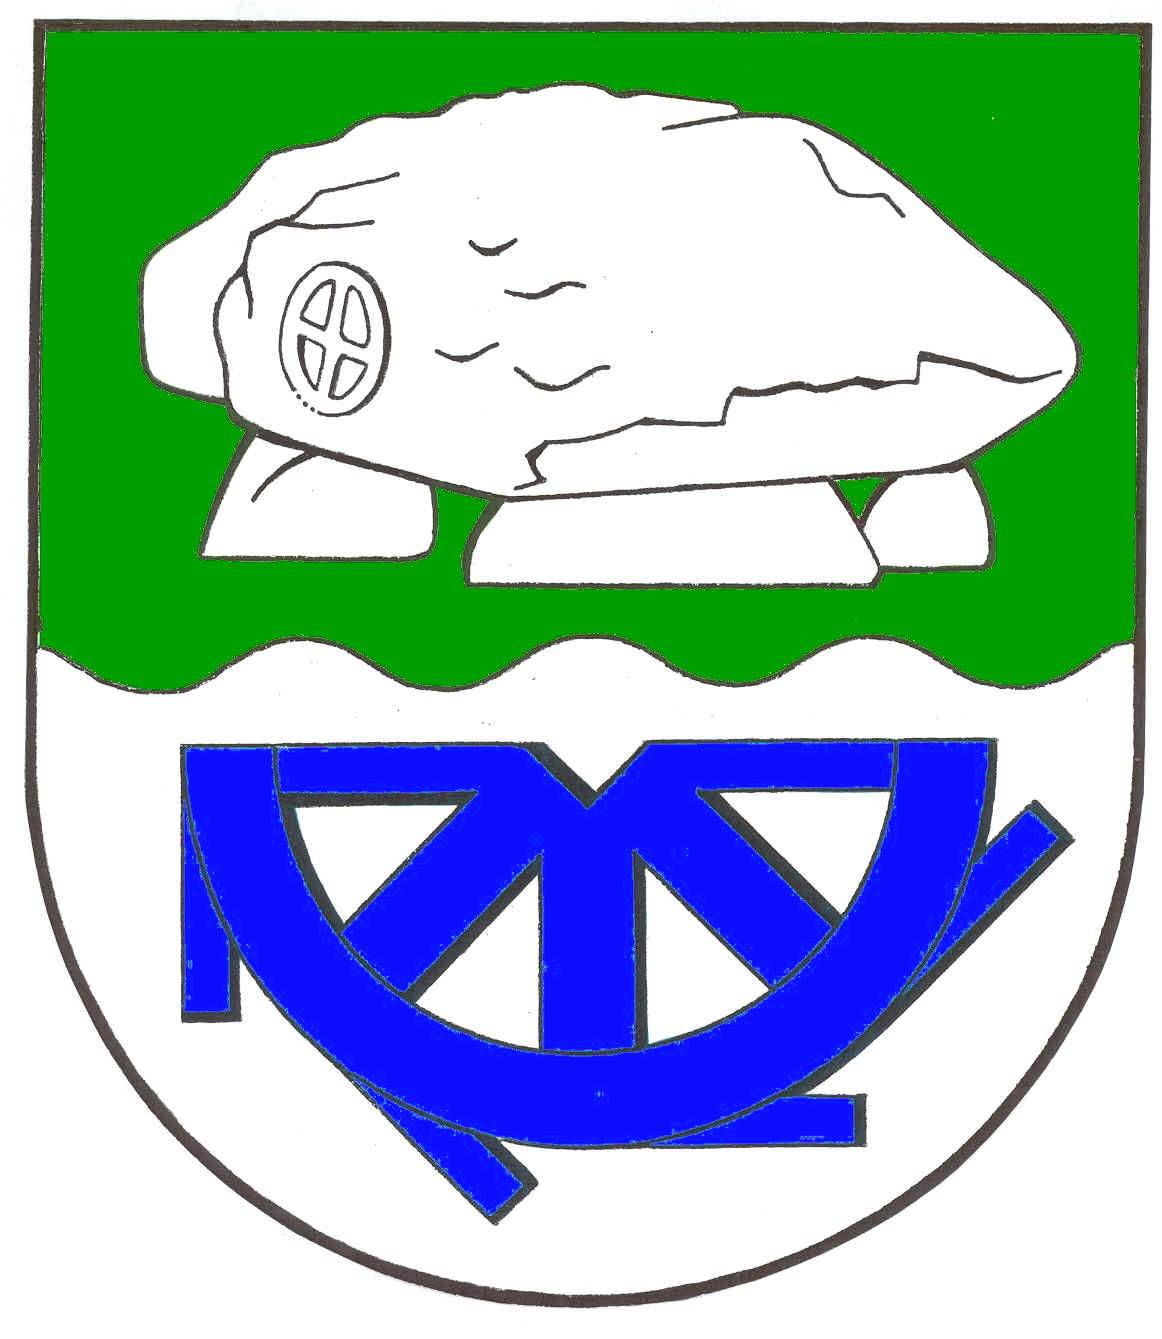 Wappen GemeindeBunsoh, Kreis Dithmarschen